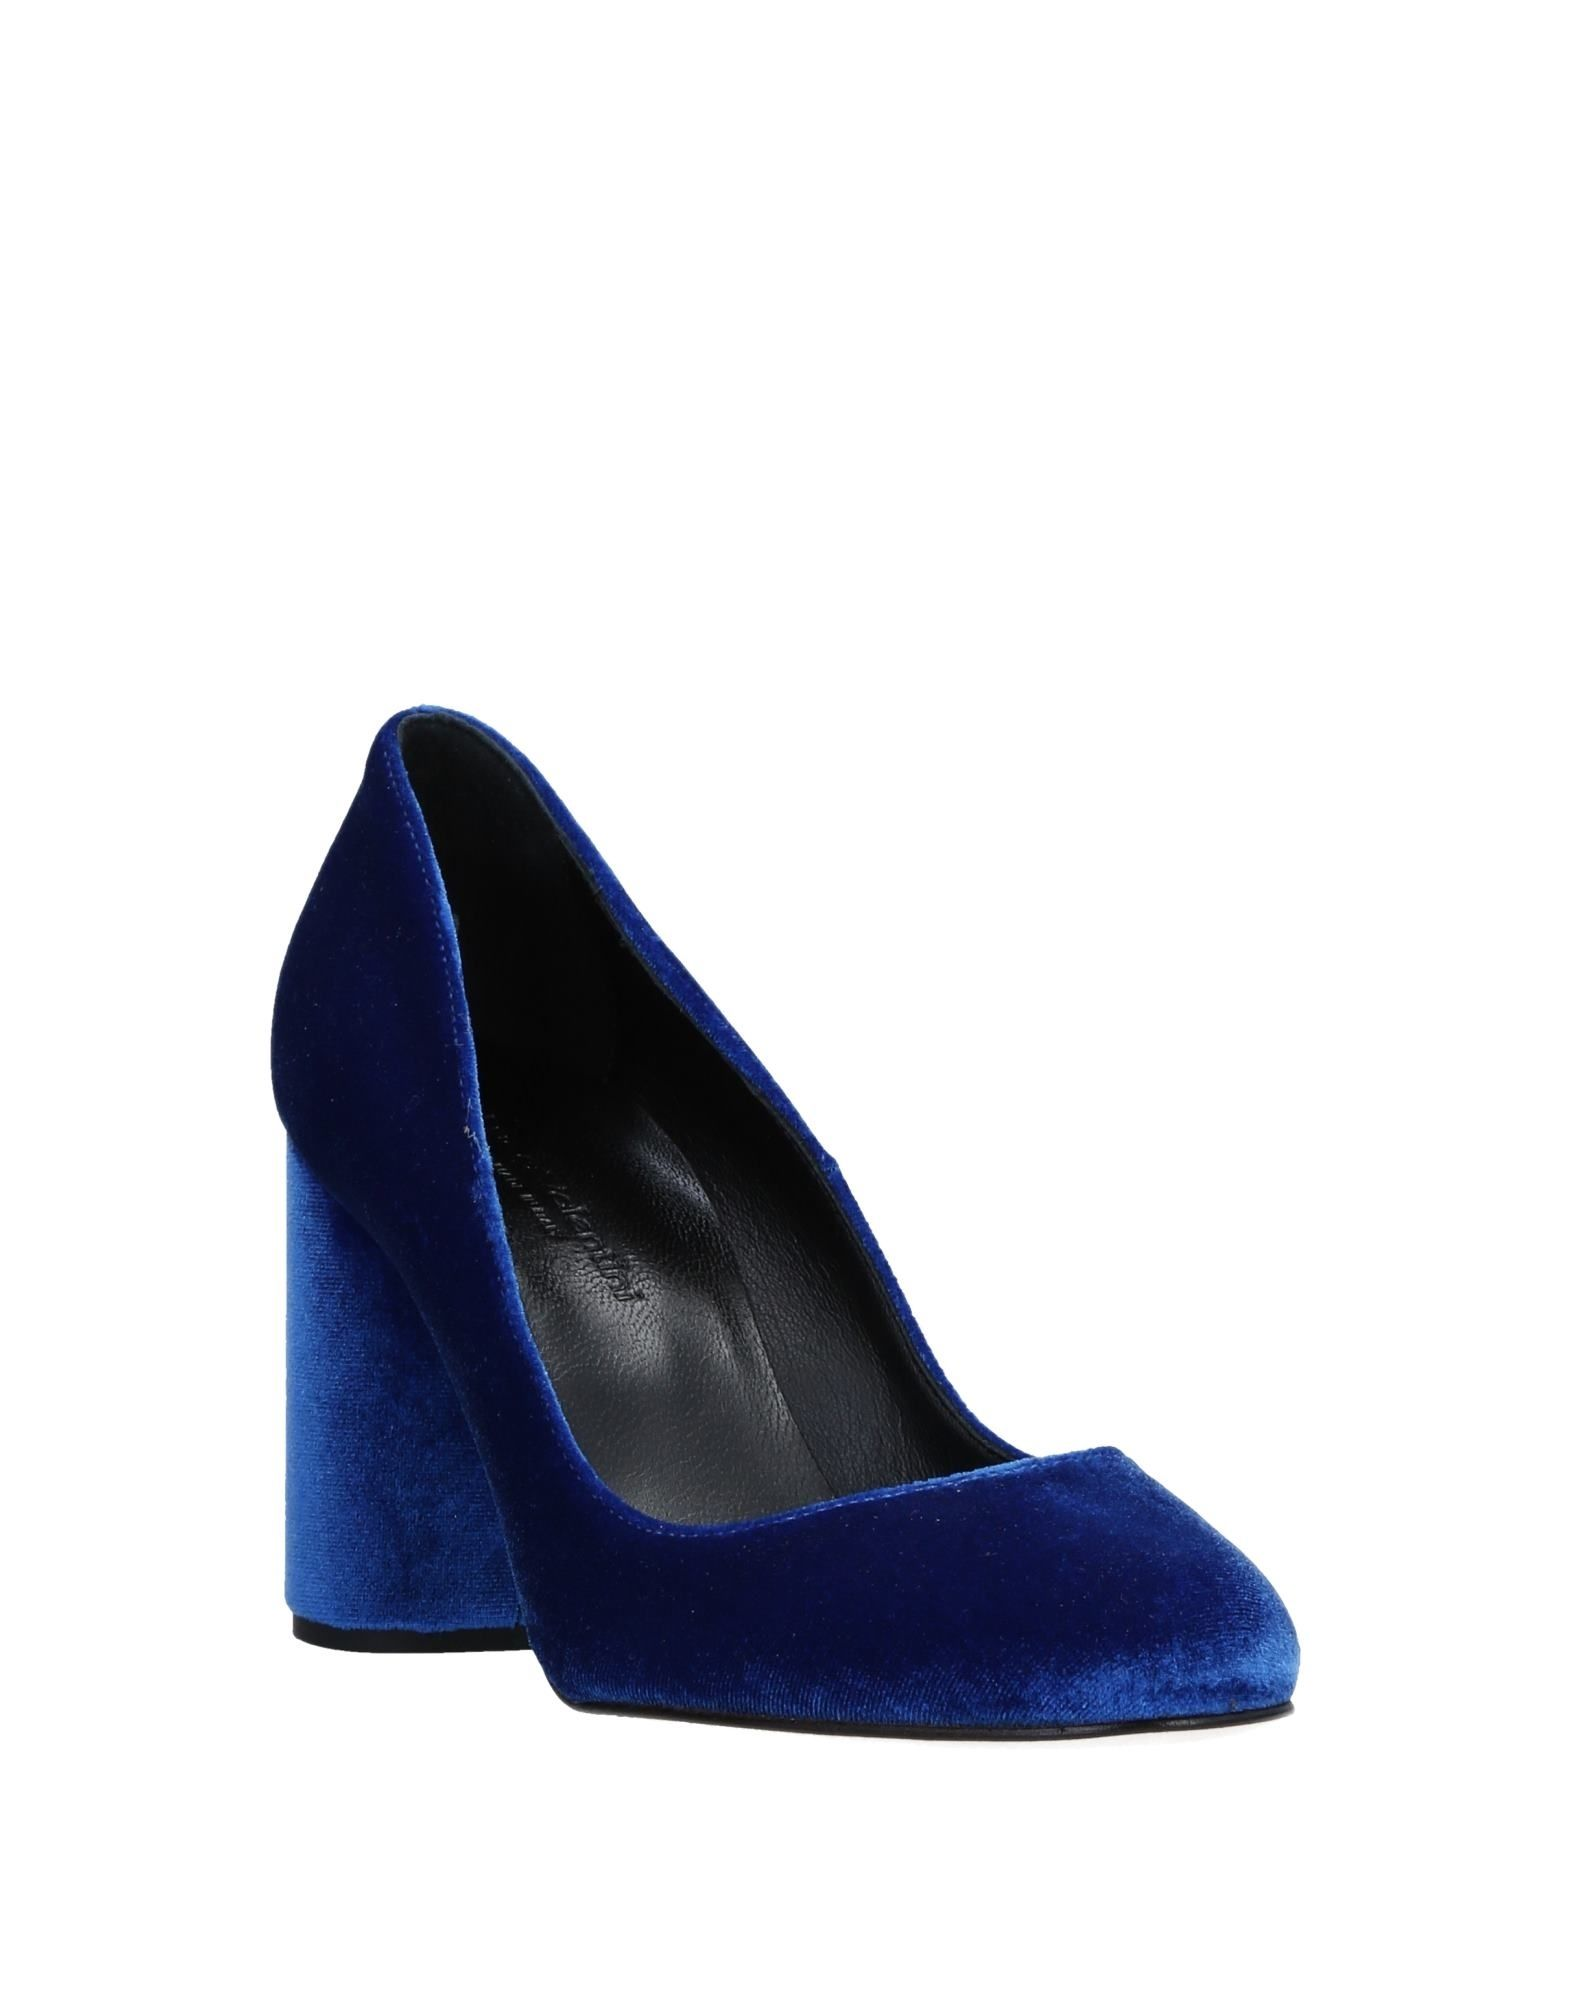 Stilvolle billige Schuhe Damen Luca Valentini Pumps Damen Schuhe  11537272TW 3c0b6c